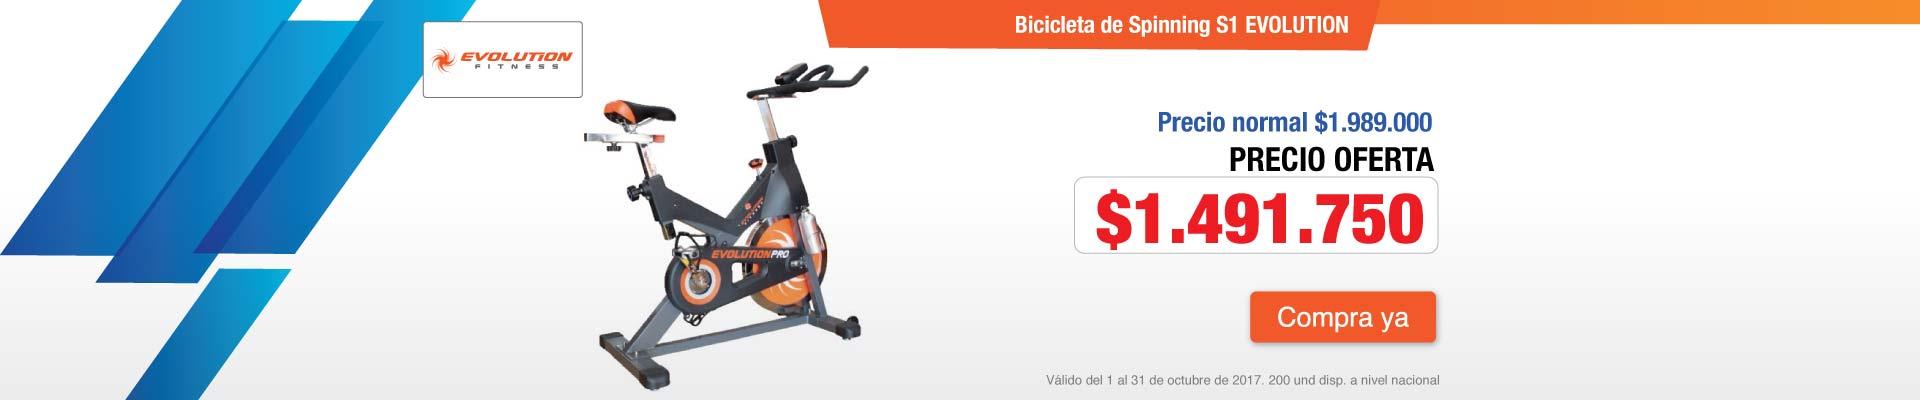 CAT-AK-4-deportes-Bicicleta-de-Spinning-S1-EVOLUTION-prod-octubre11-13